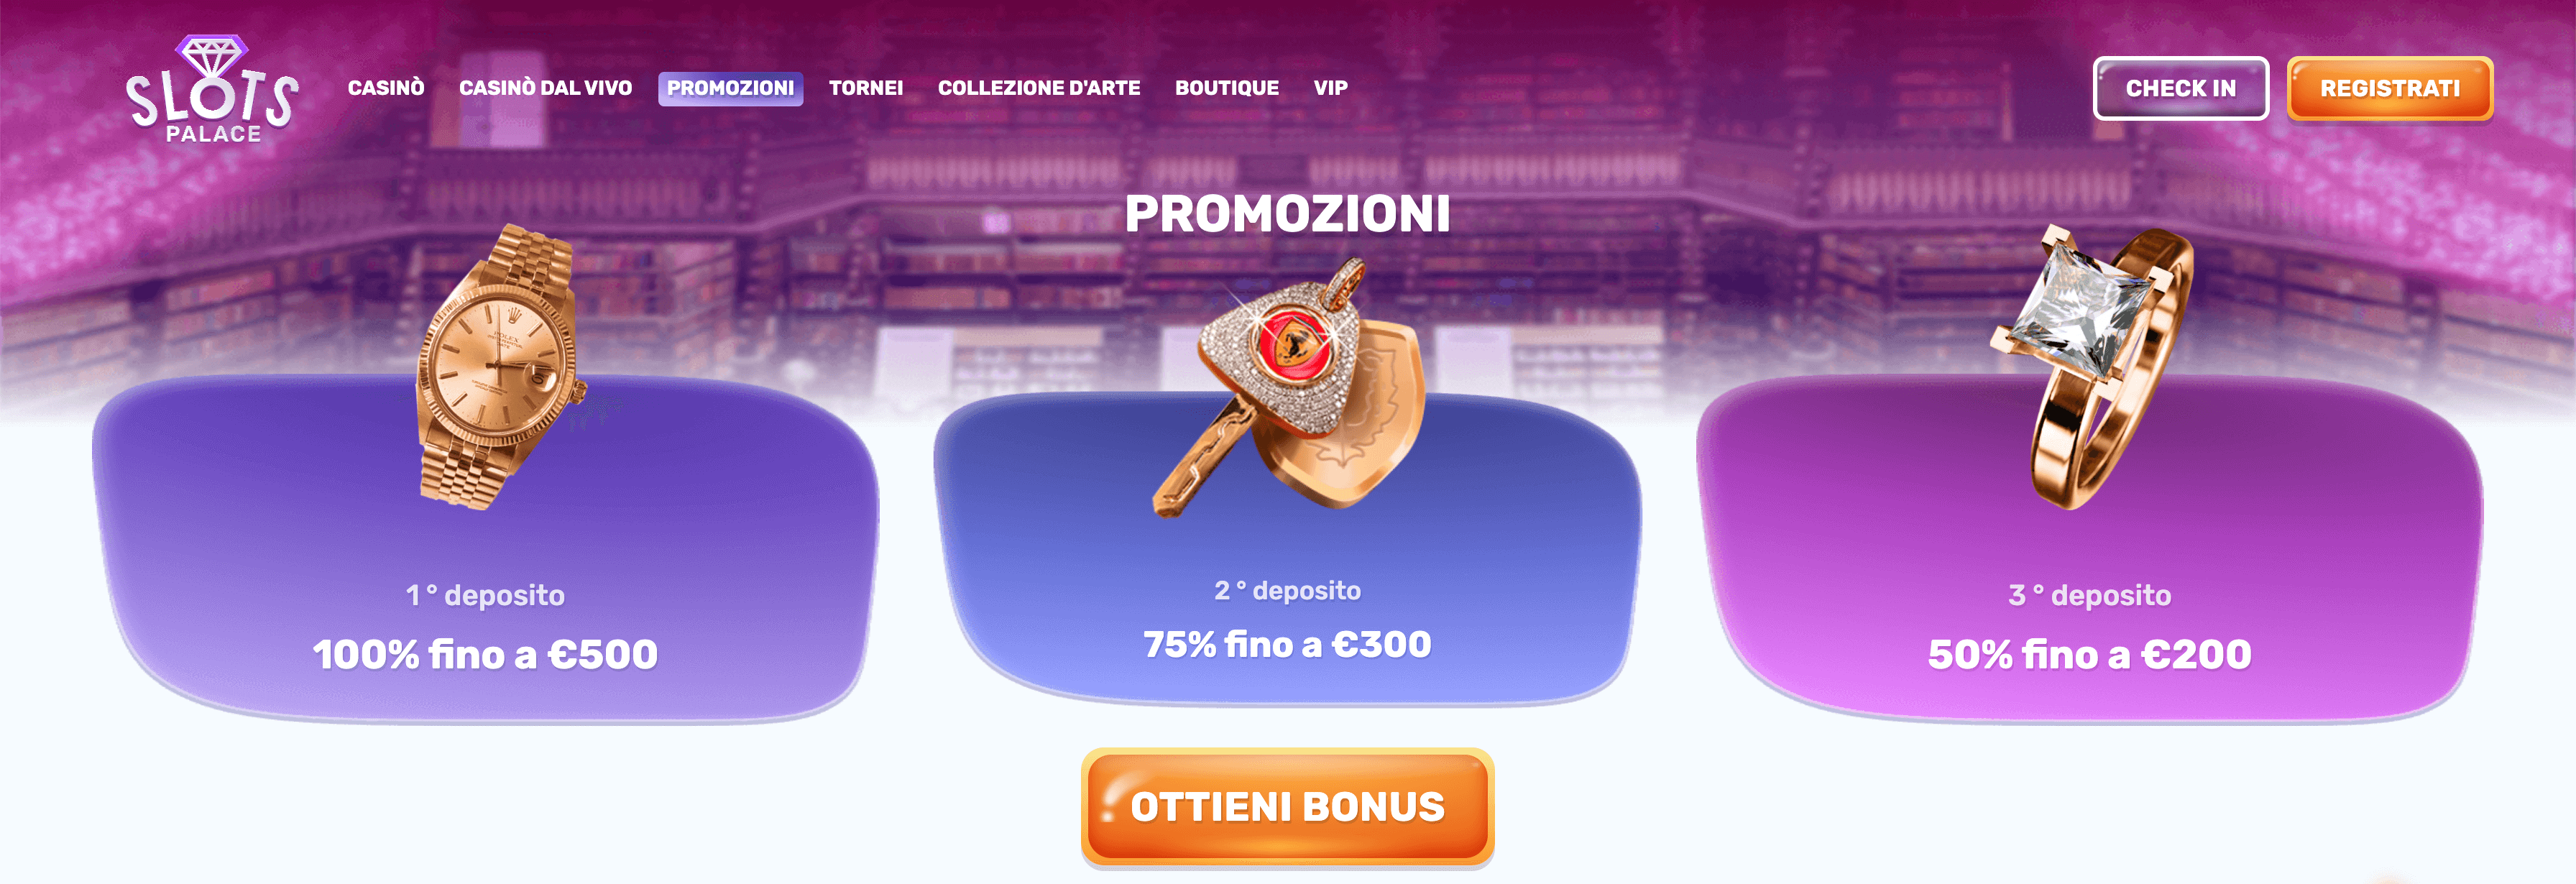 SlotsPalace casino bonus benvenuto